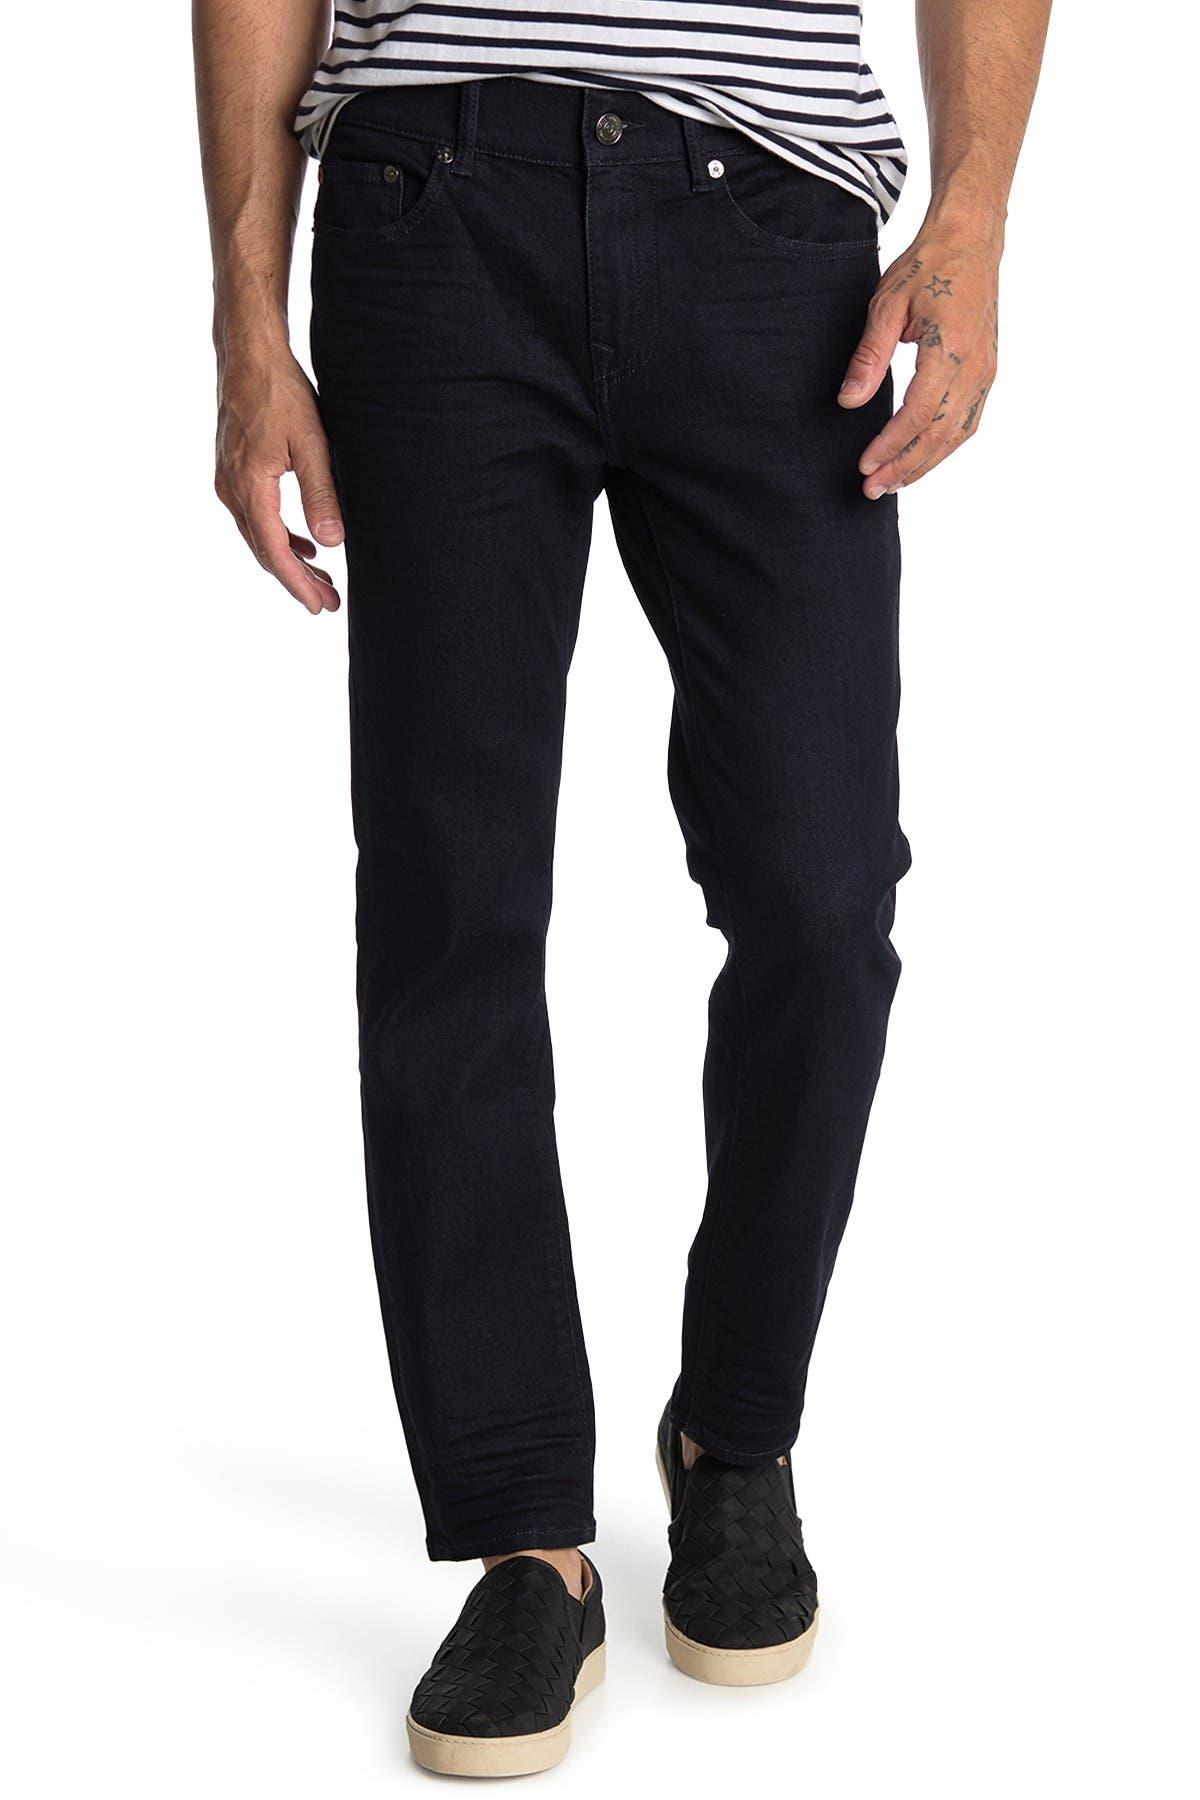 Image of True Religion Geno No Flap Straight Leg Jeans